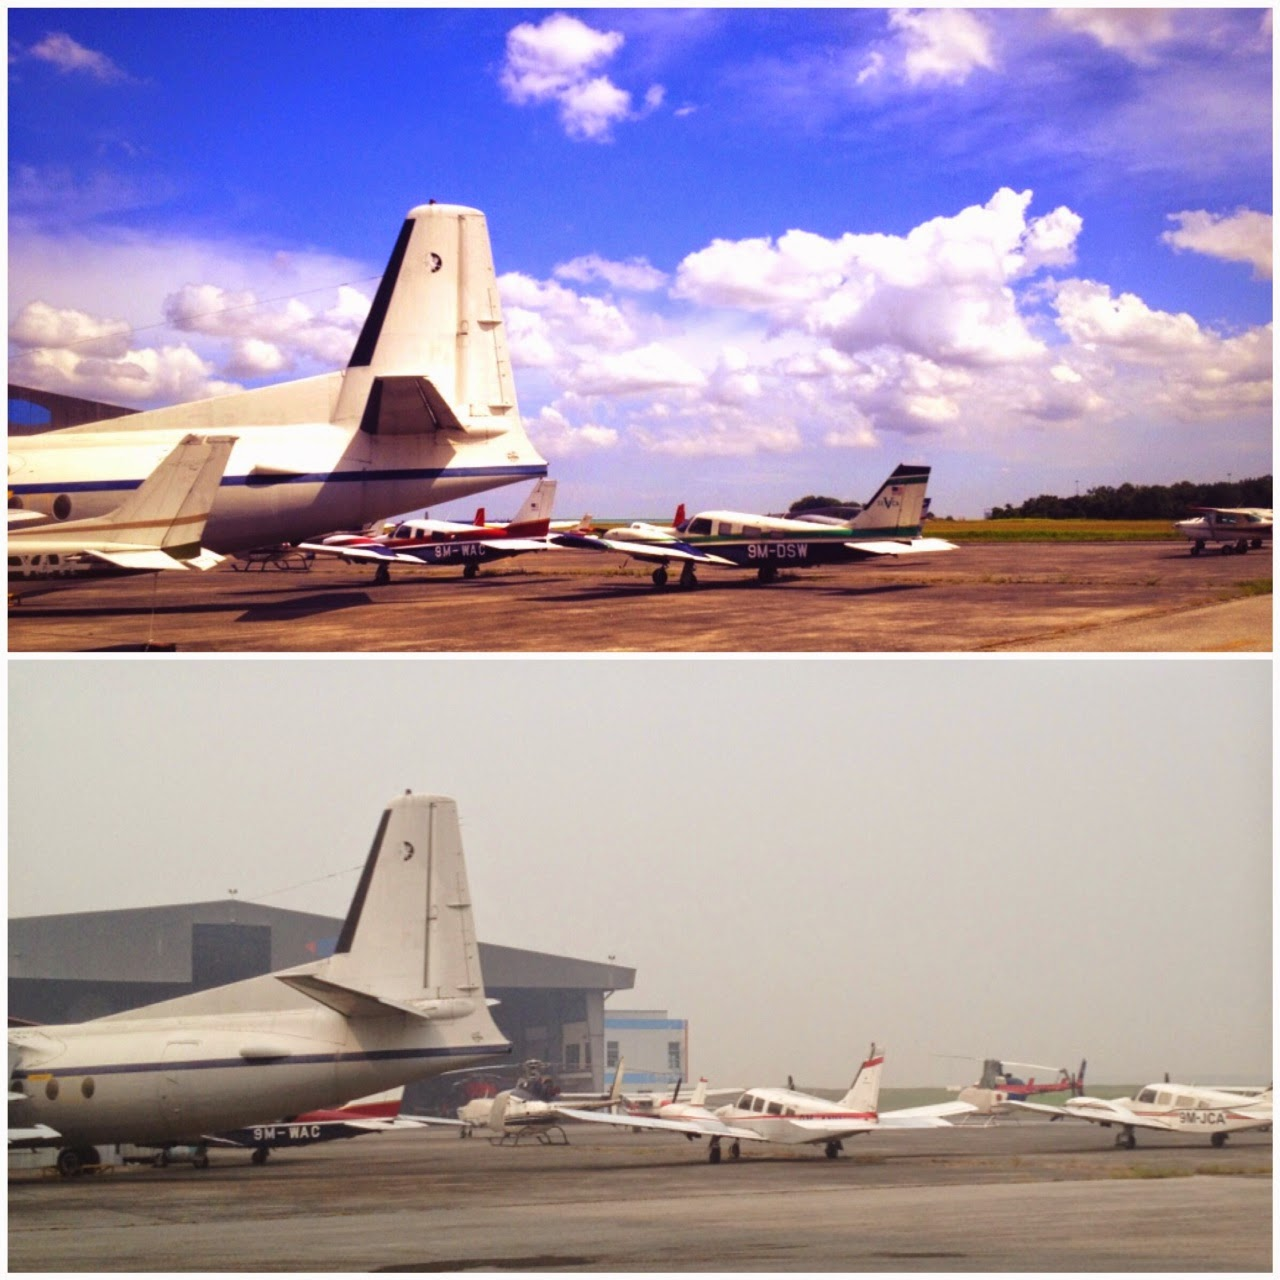 HAZE MALAYSIA SUBANG AIRPORT LOW VISIBILITY JUNE 2013